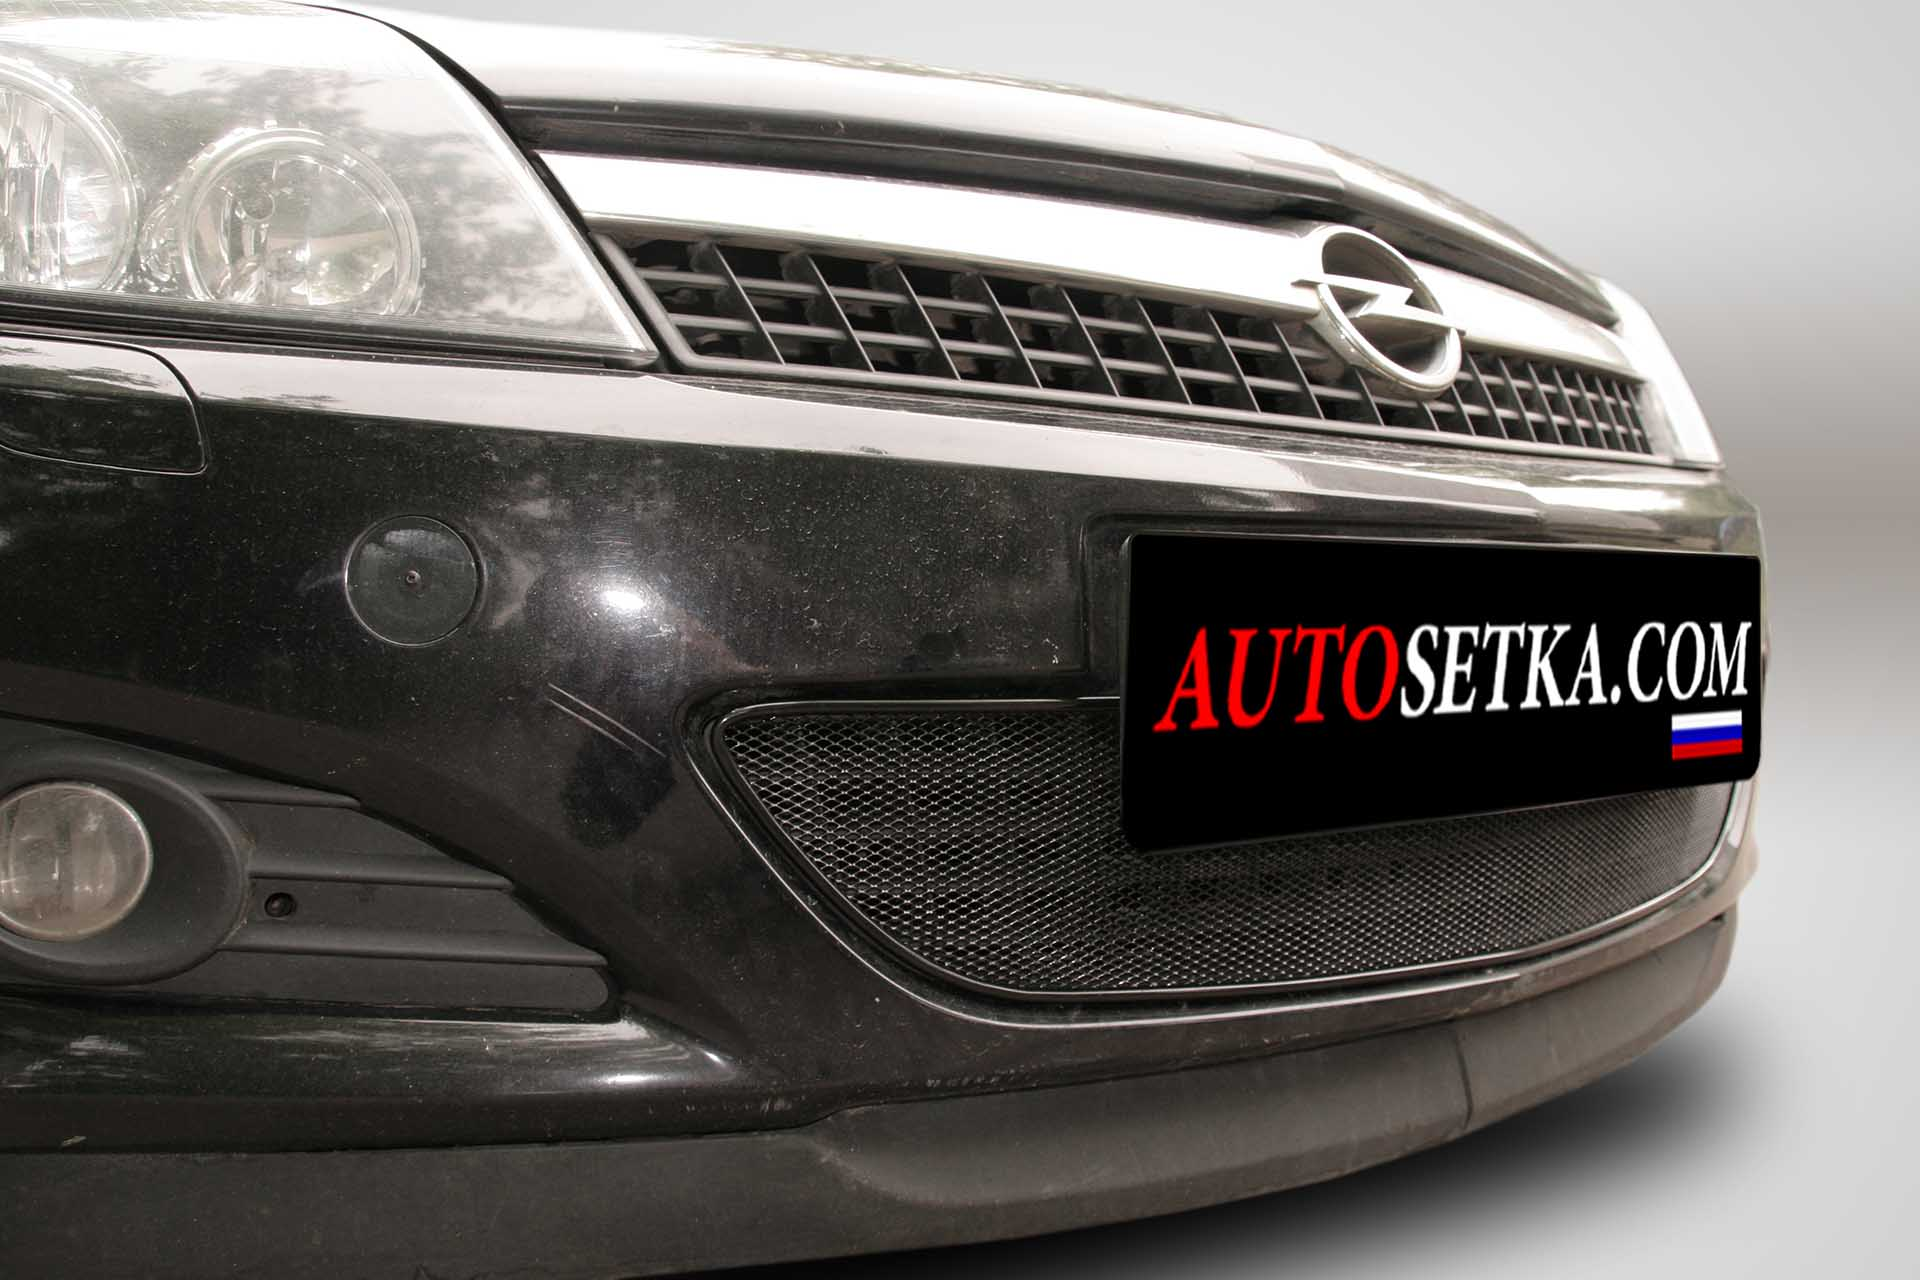 Opel Astra GTC (2009-2014)